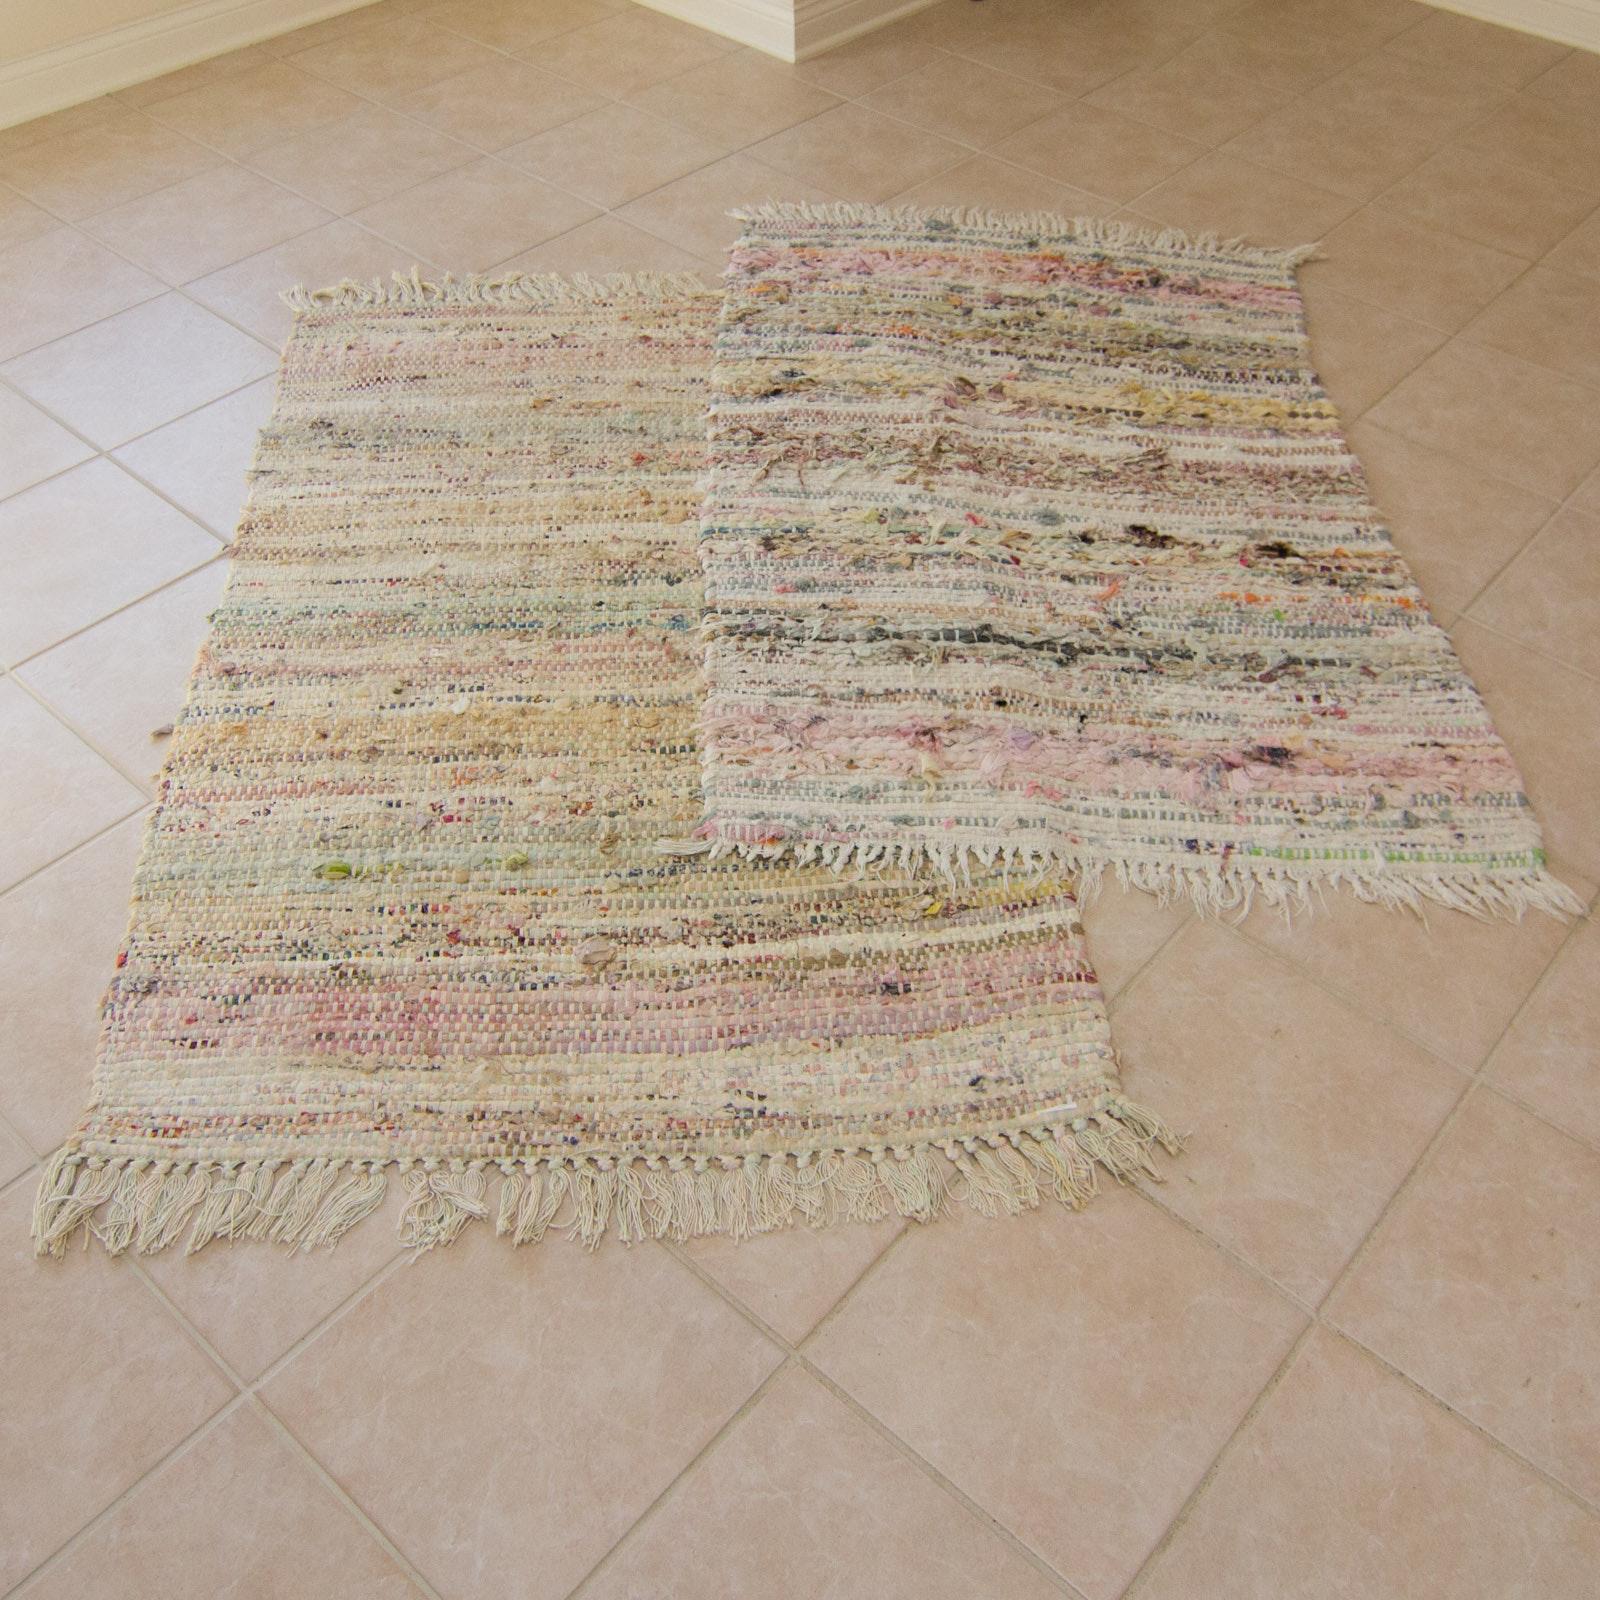 Two Handmade Woven Rag Rugs